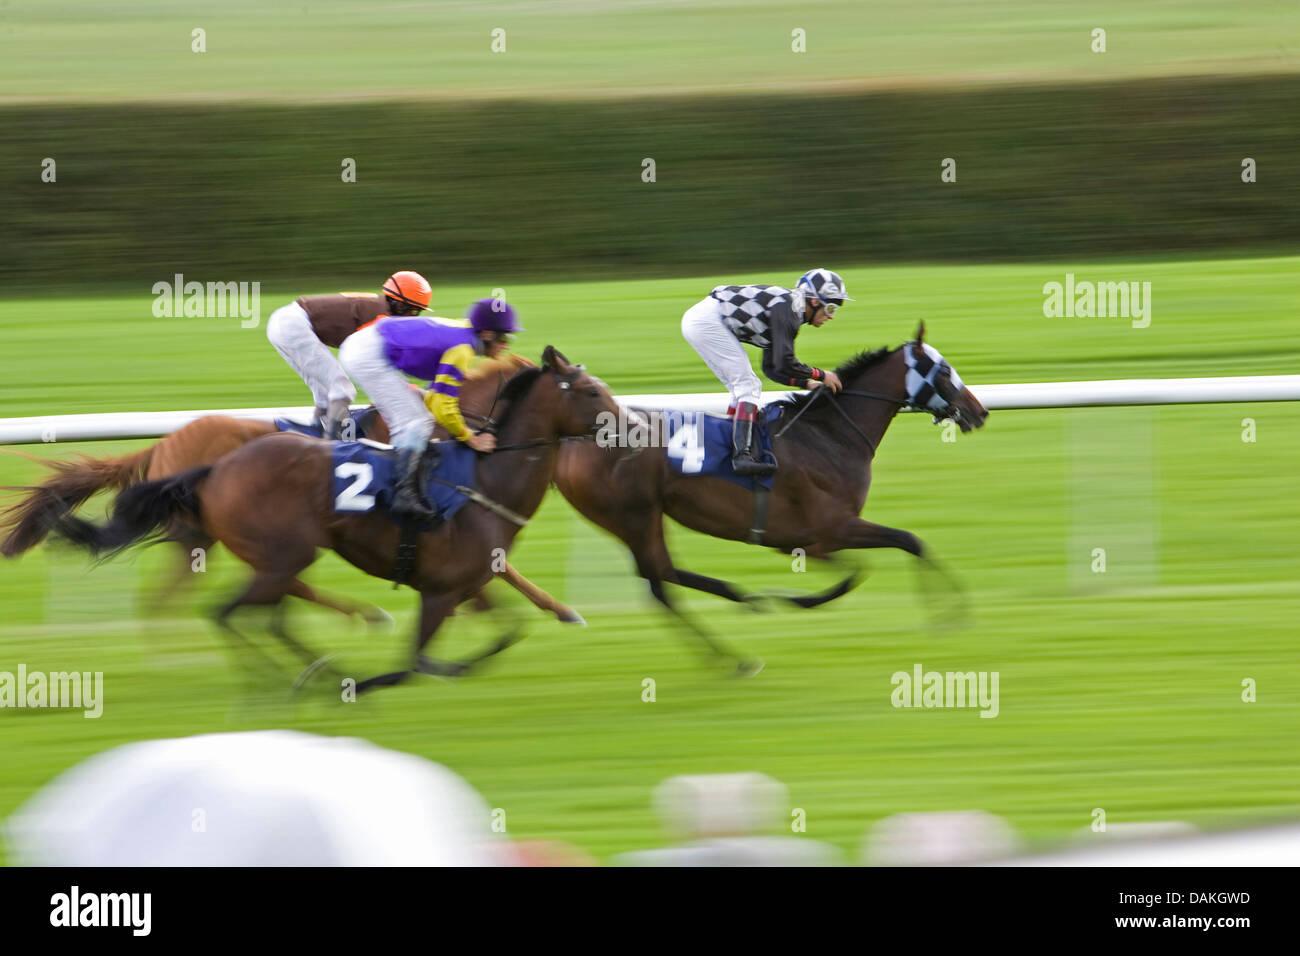 Caballo doméstico (Equus caballus przewalskii. f), carreras de caballos Imagen De Stock